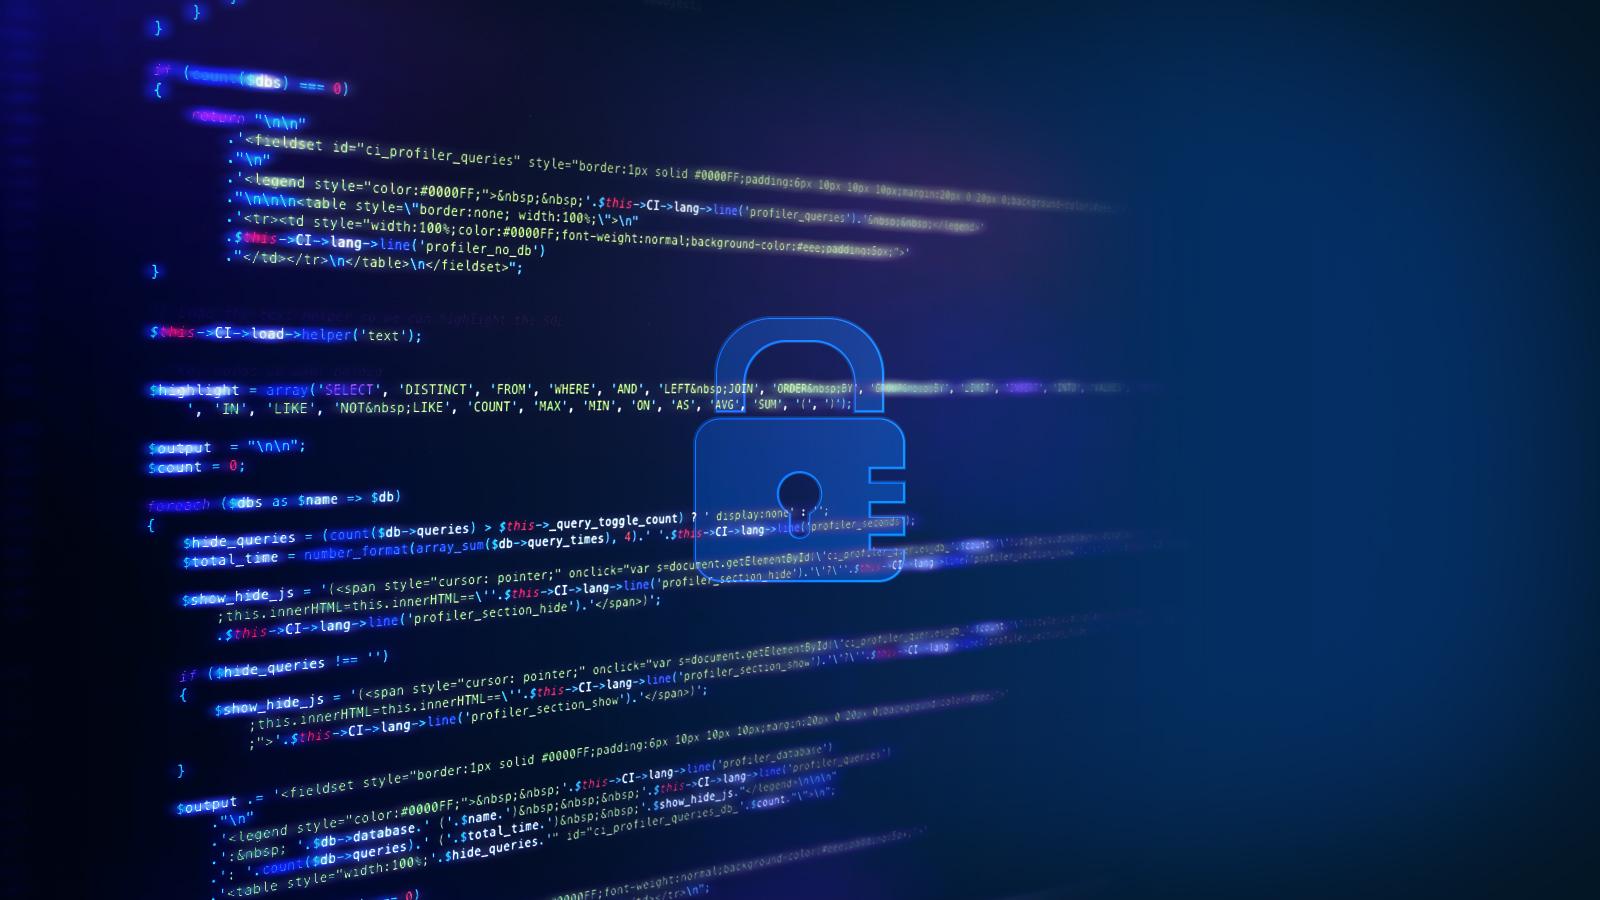 Baylor Cybersecurity